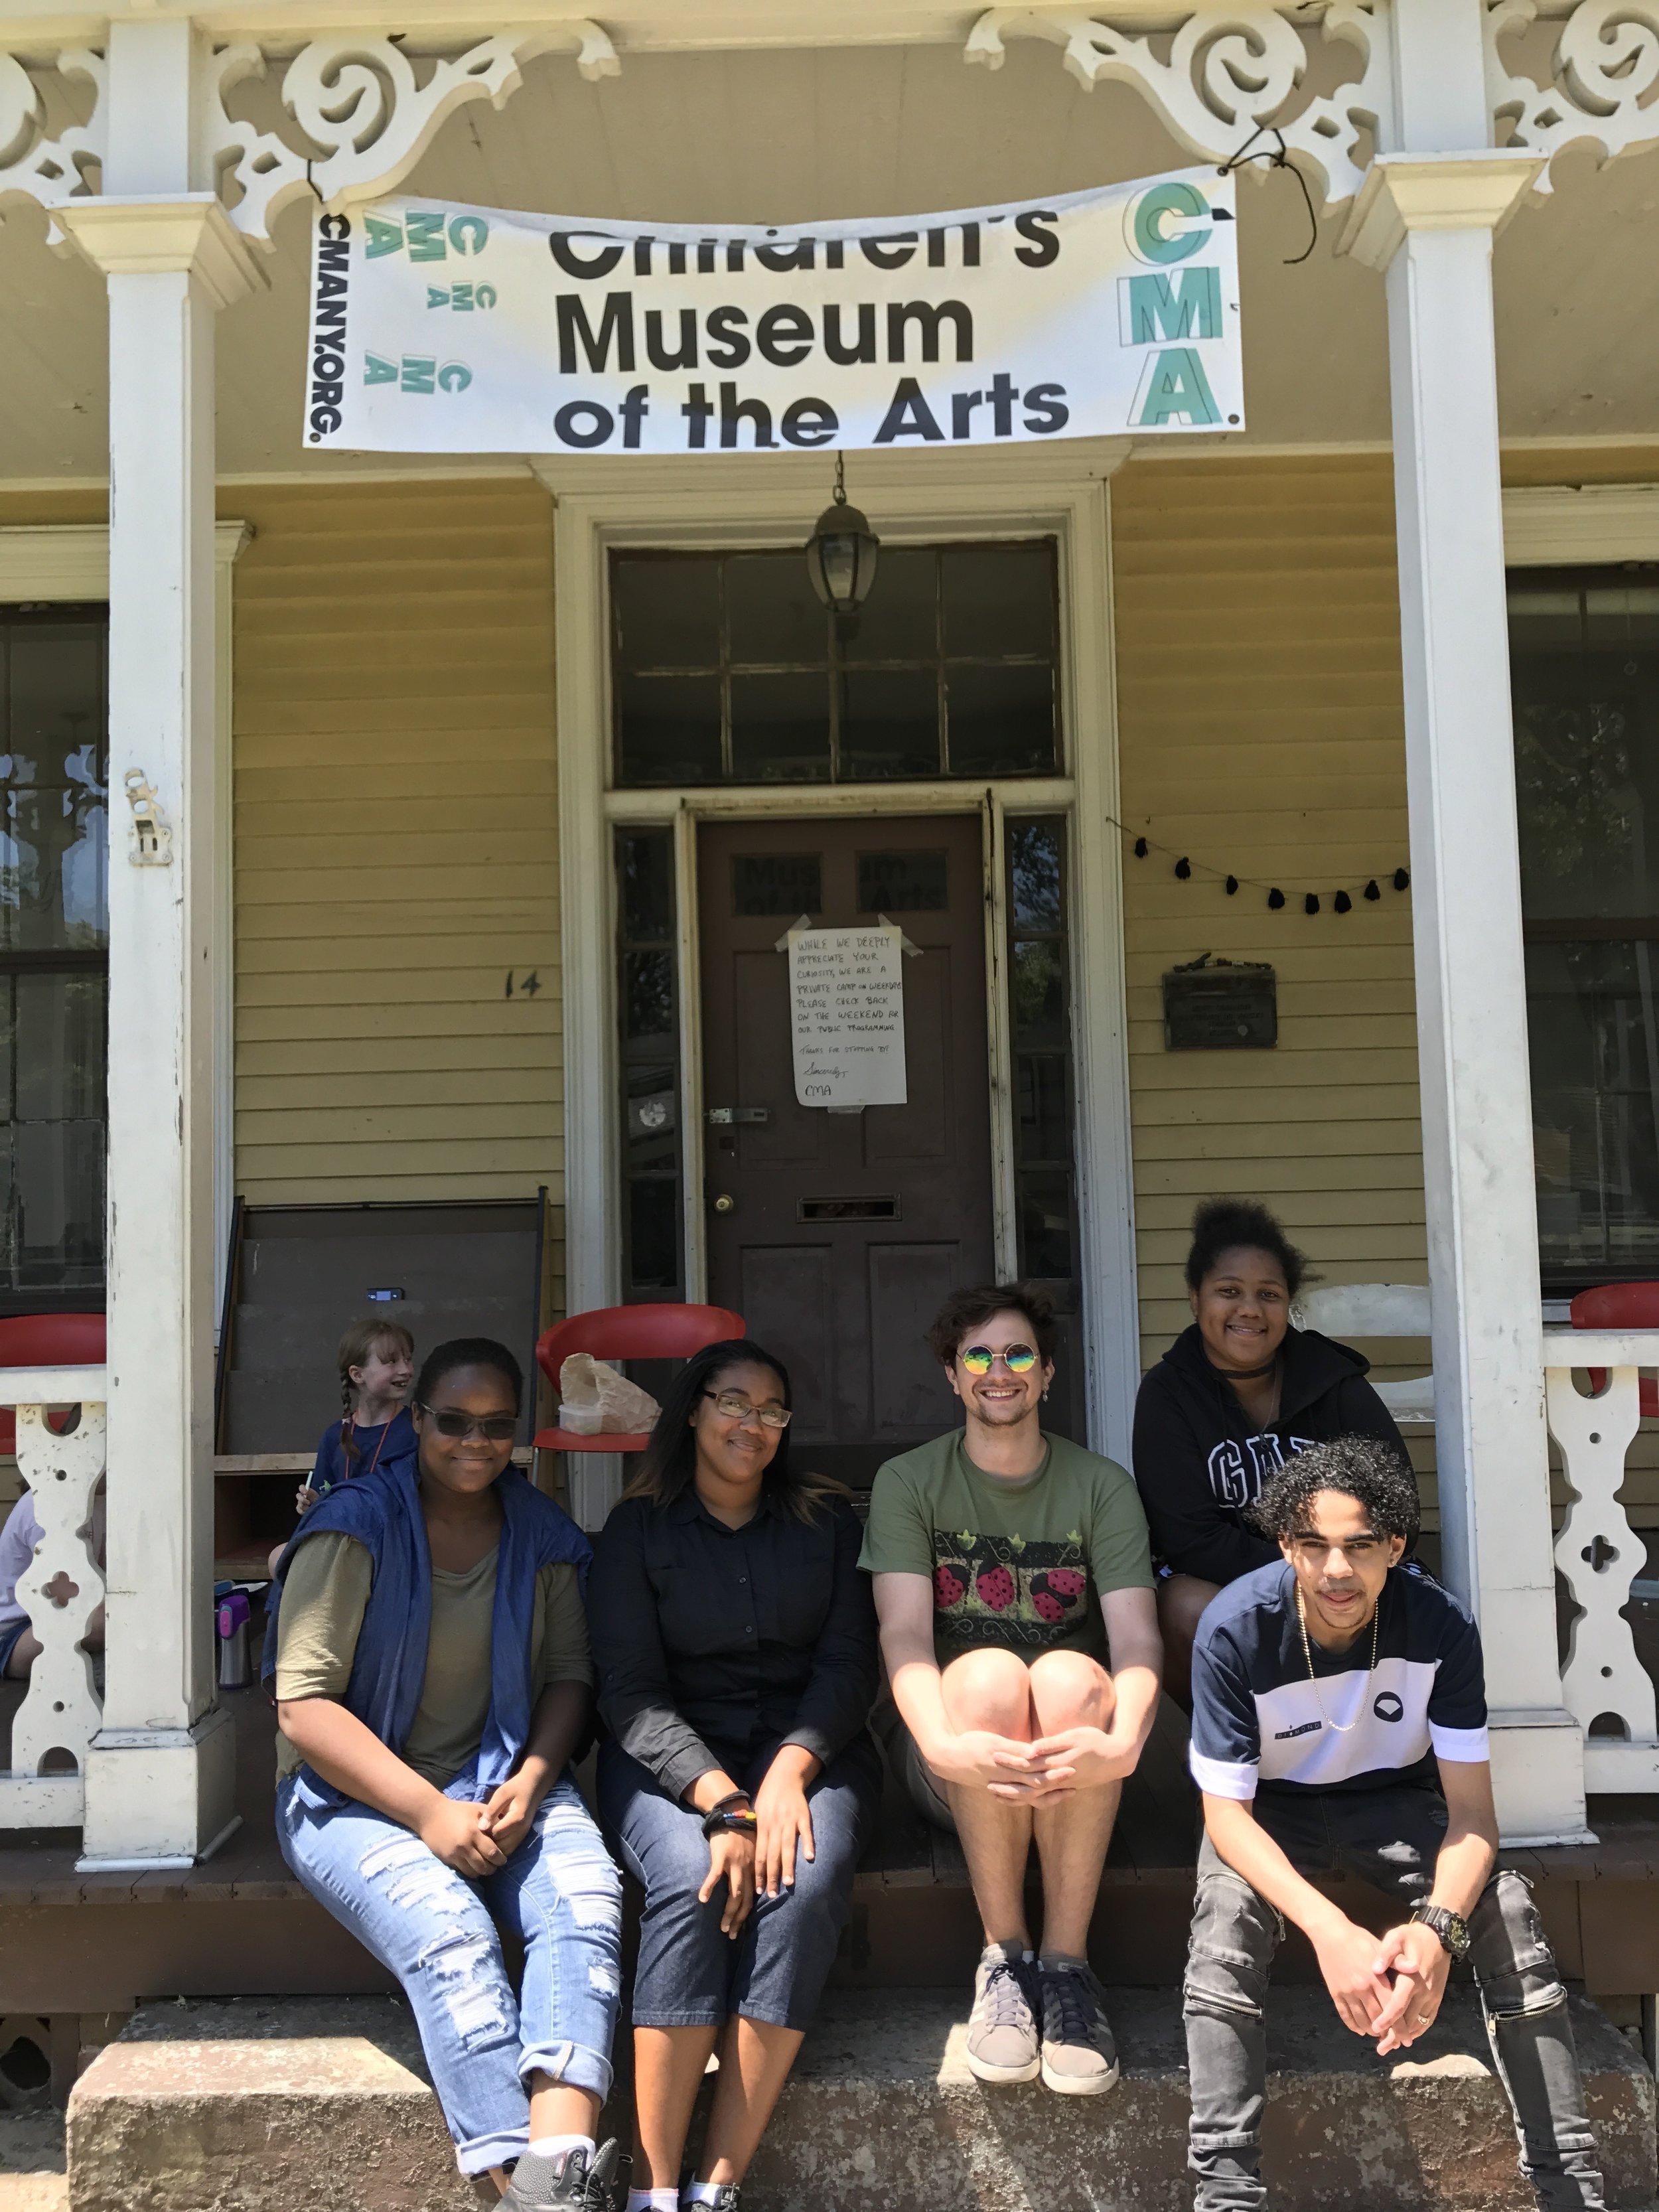 MECA interns at their summer job at the Children's Museum of Art, August 2017